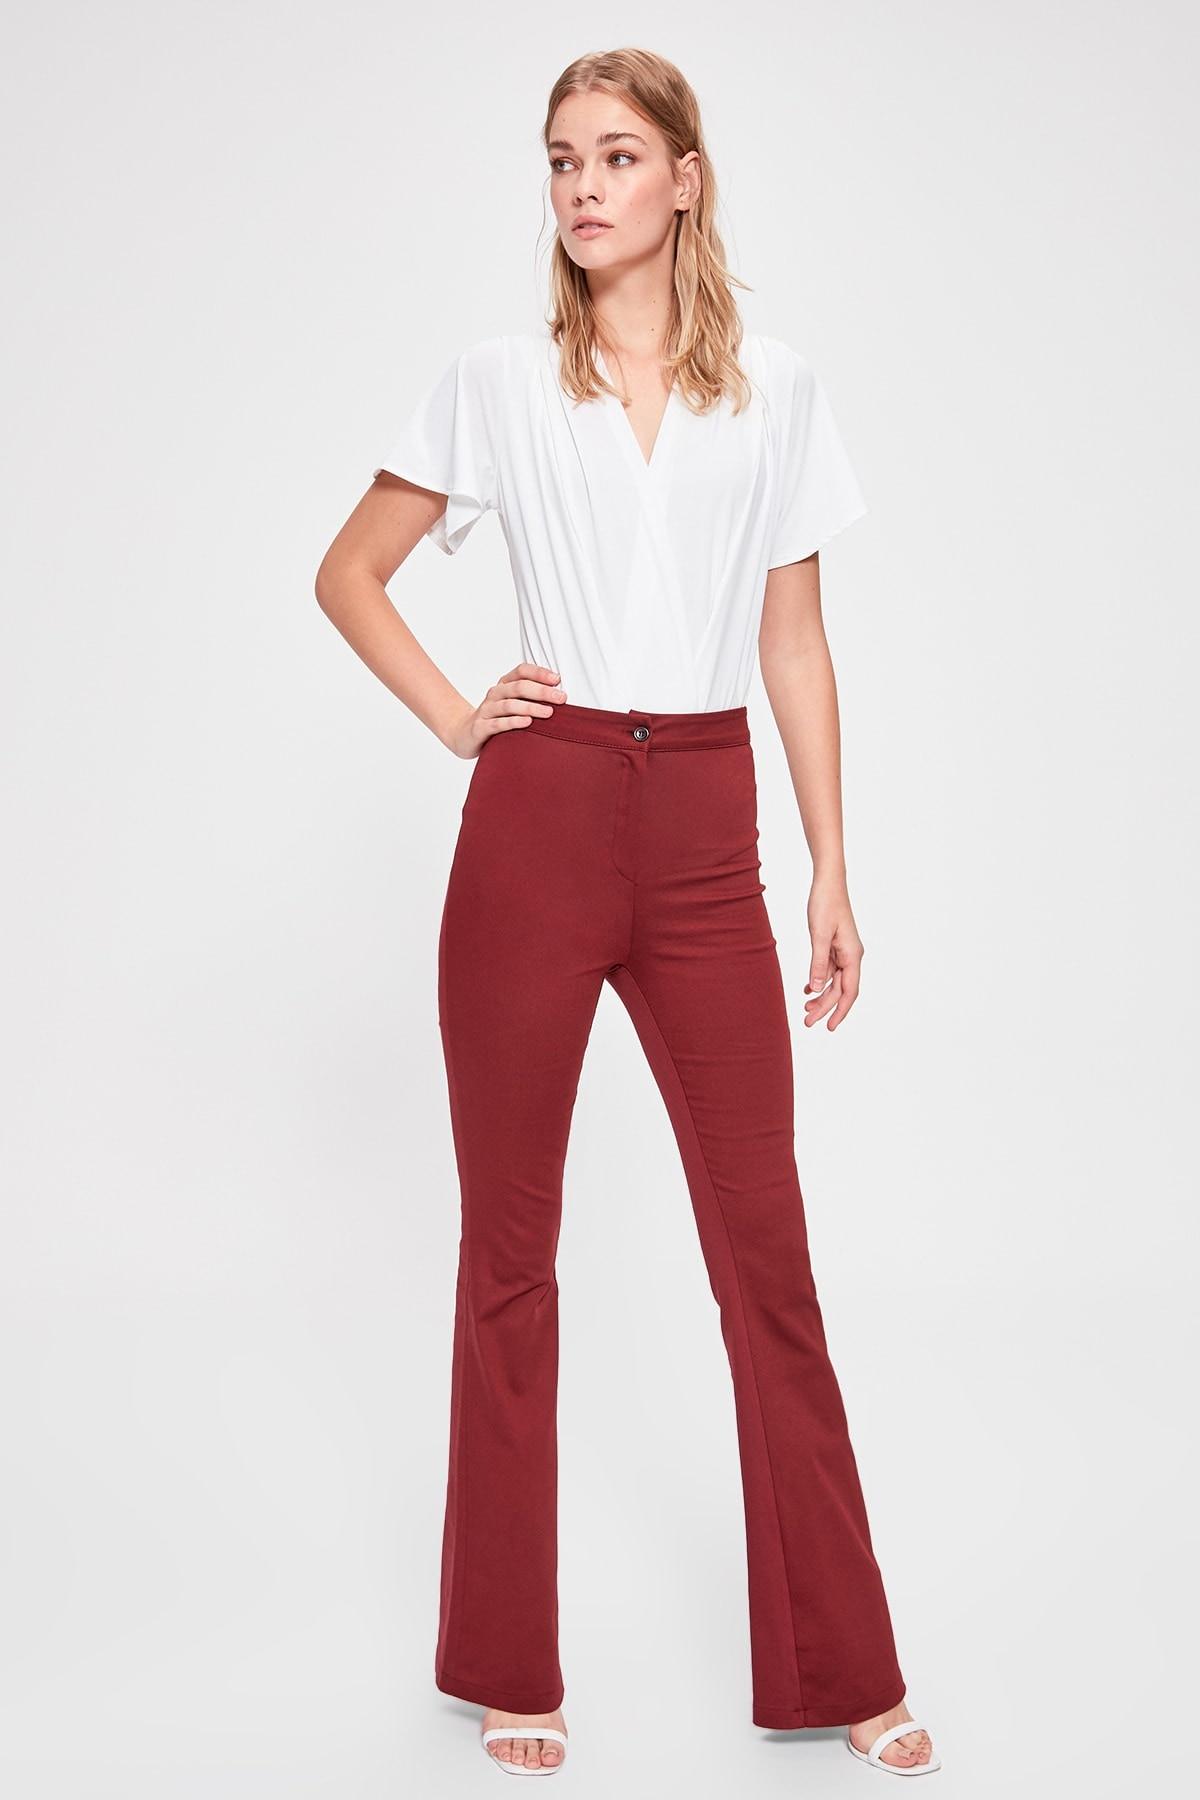 Trendyol Spanish Bell-Bottomed Pants TWOAW20PL0422